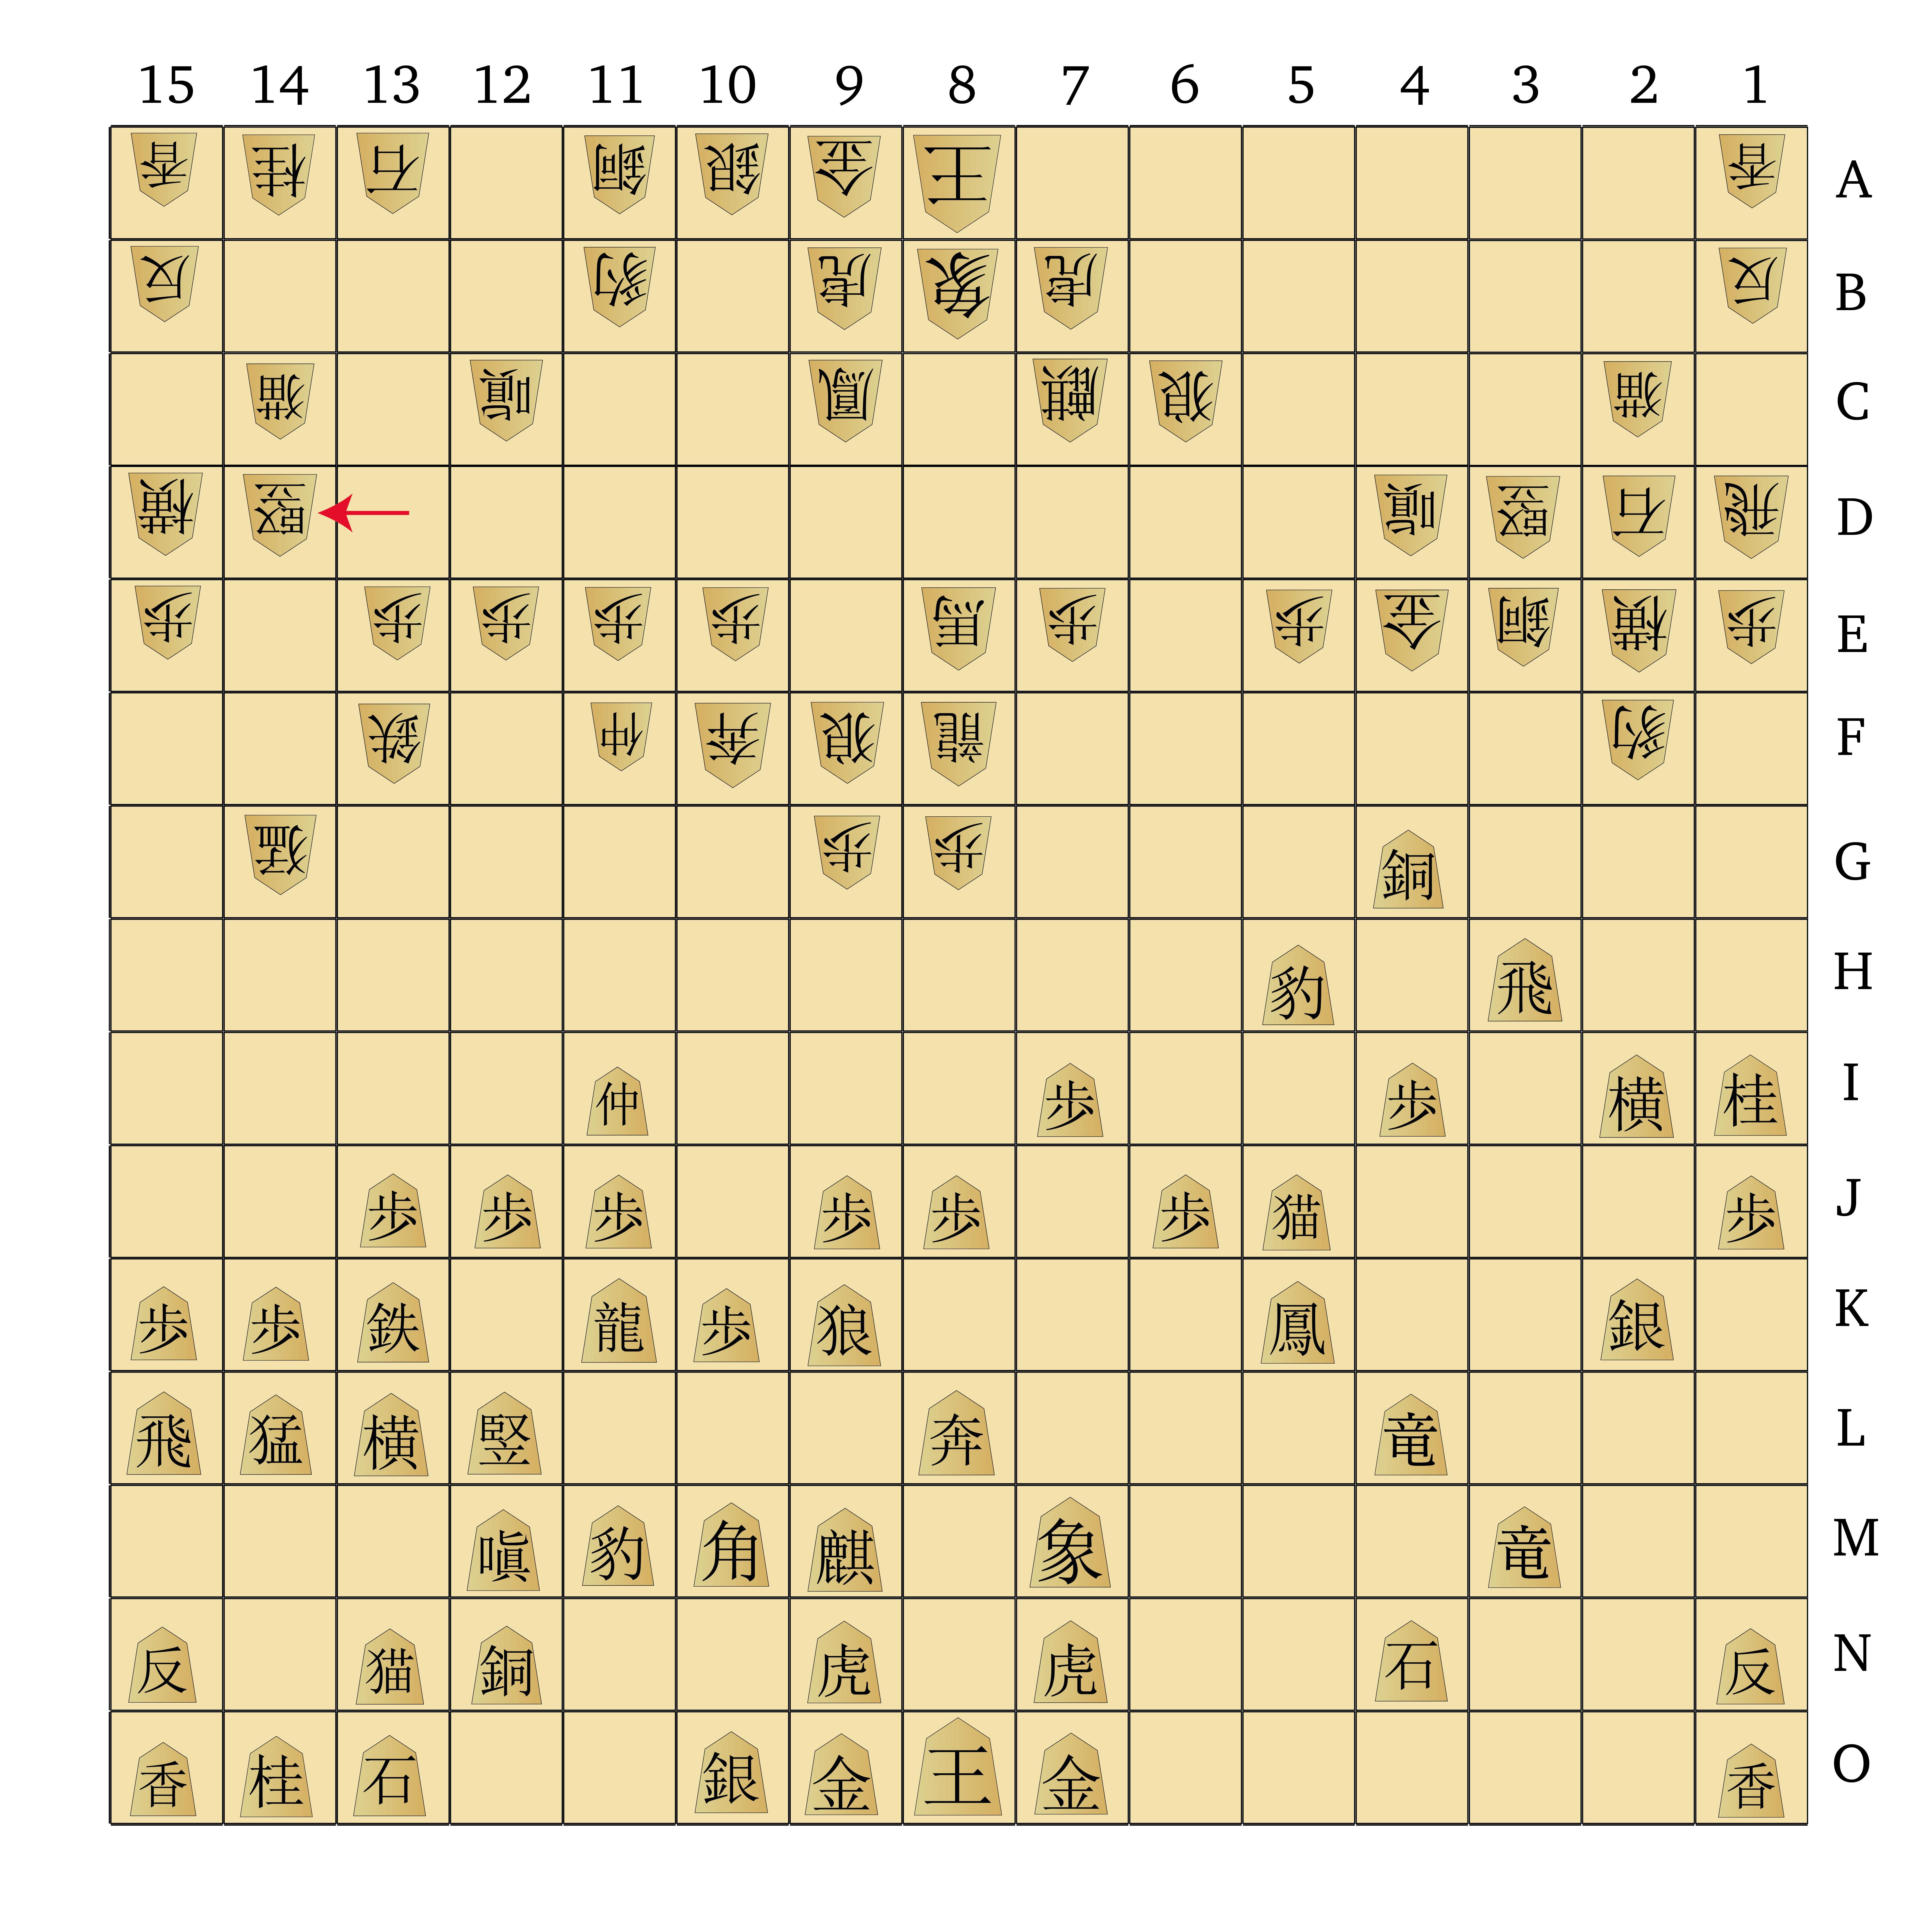 Dai Shogi 420 -- Move 220-01